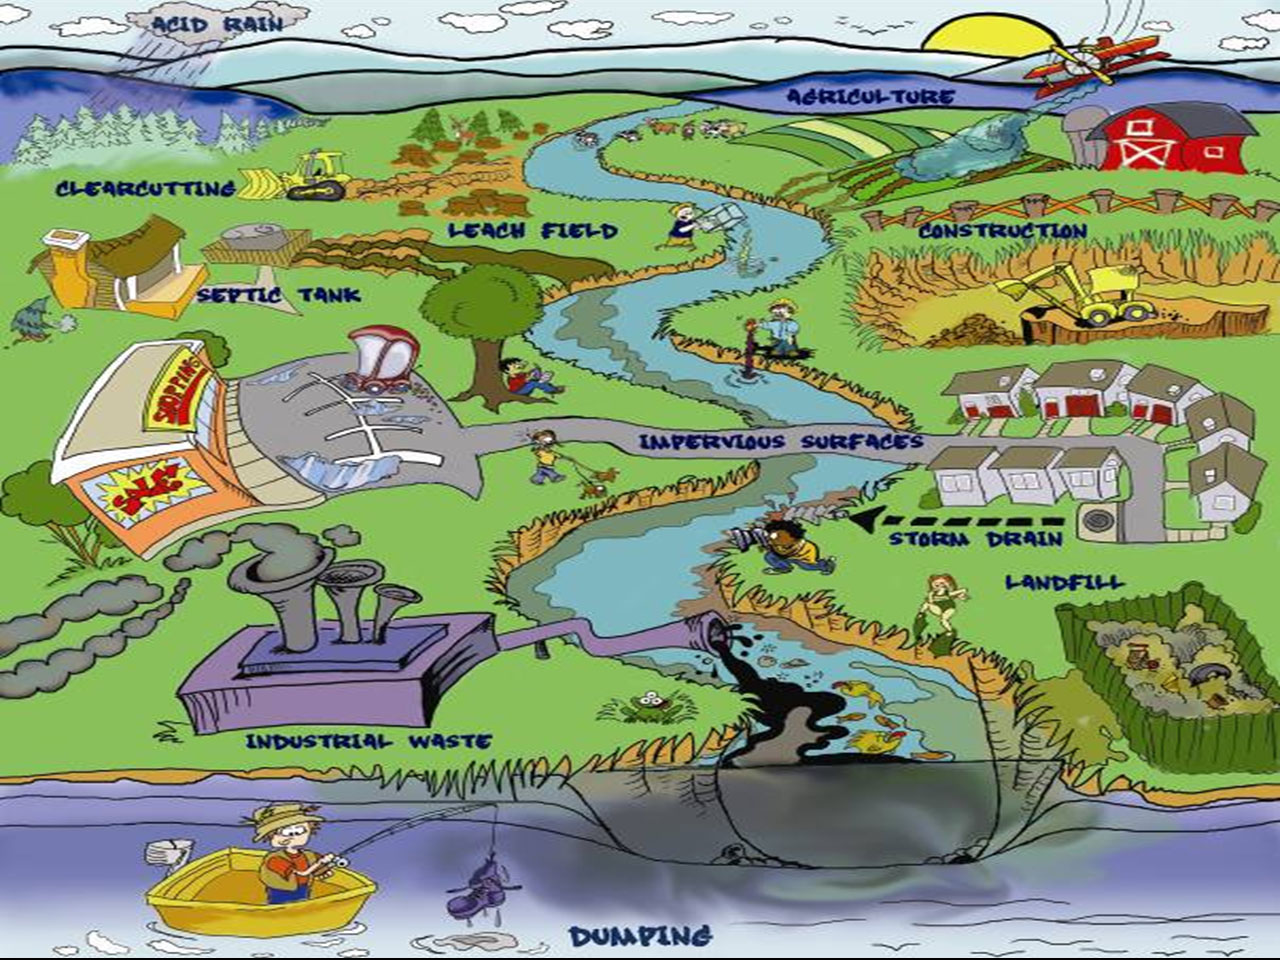 On Air Pollution Sources Diagram on Farm Vs City Worksheet For Kindergarten